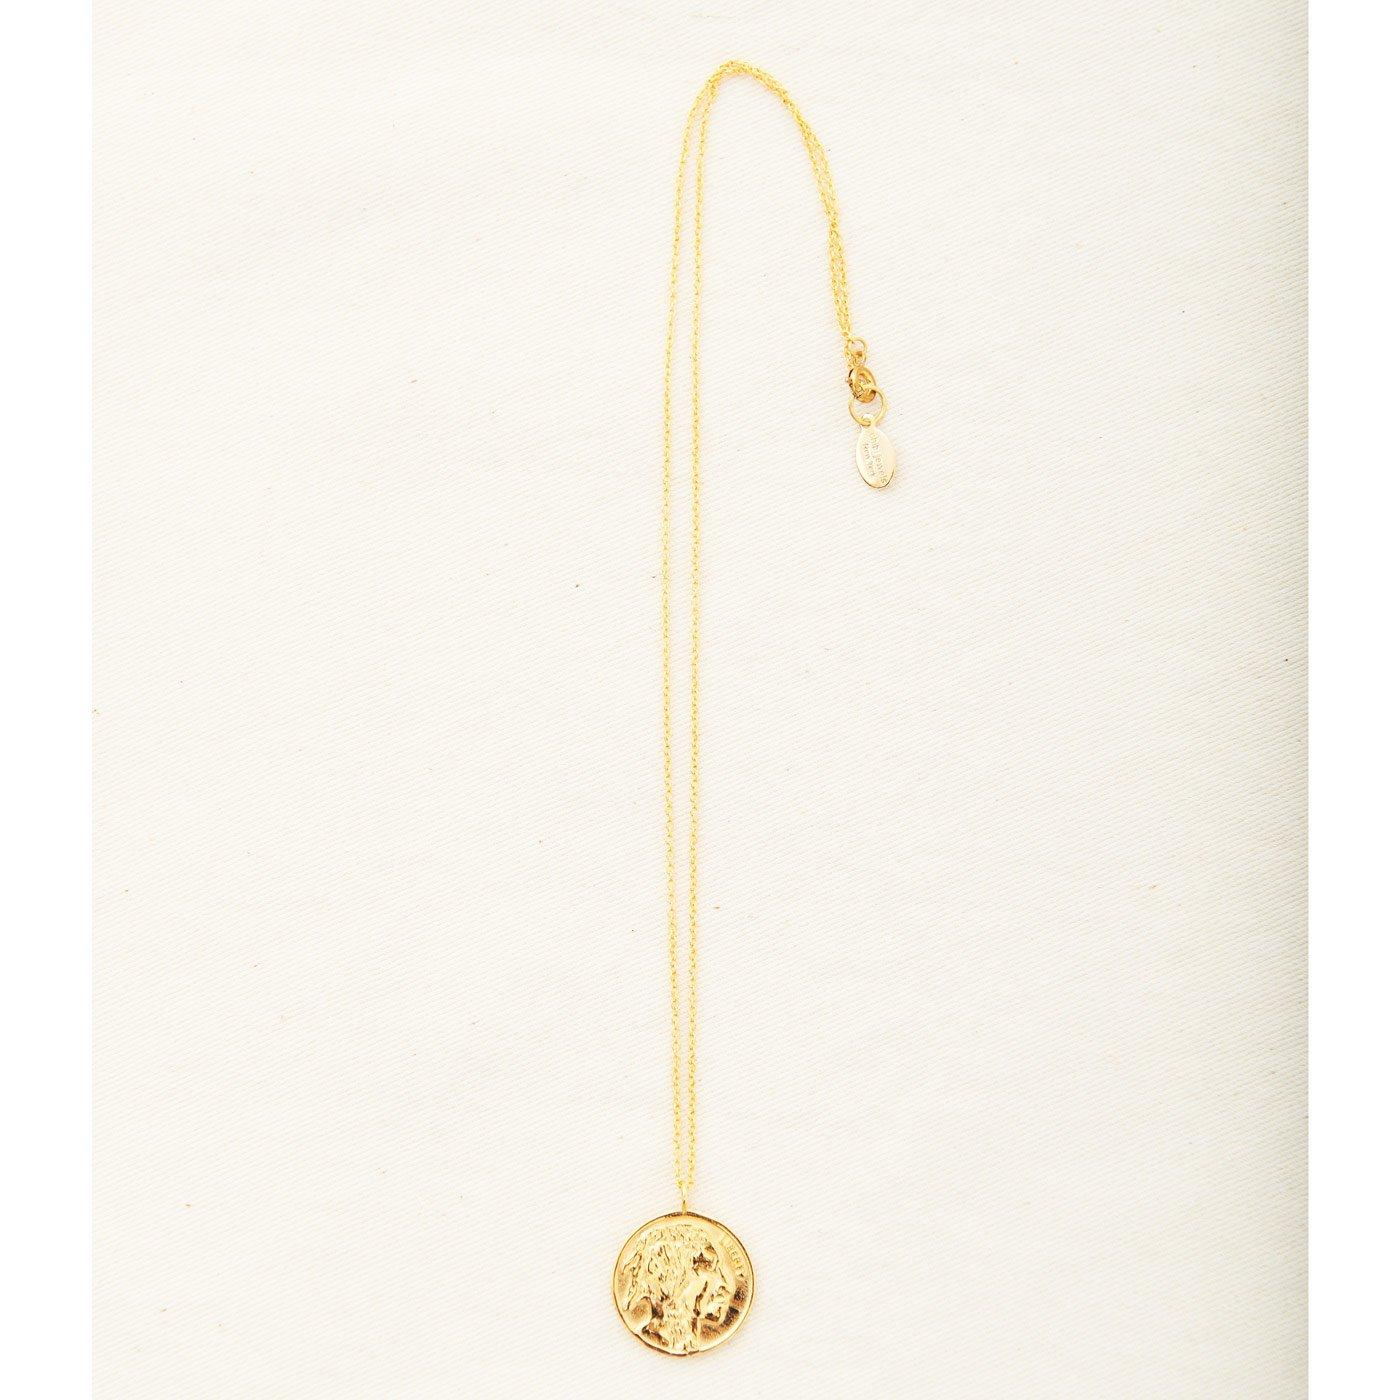 IEDIT[イディット] SELECT chibi jewels ネイティブデザインのコインメダリオンネックレス〈ゴールド〉